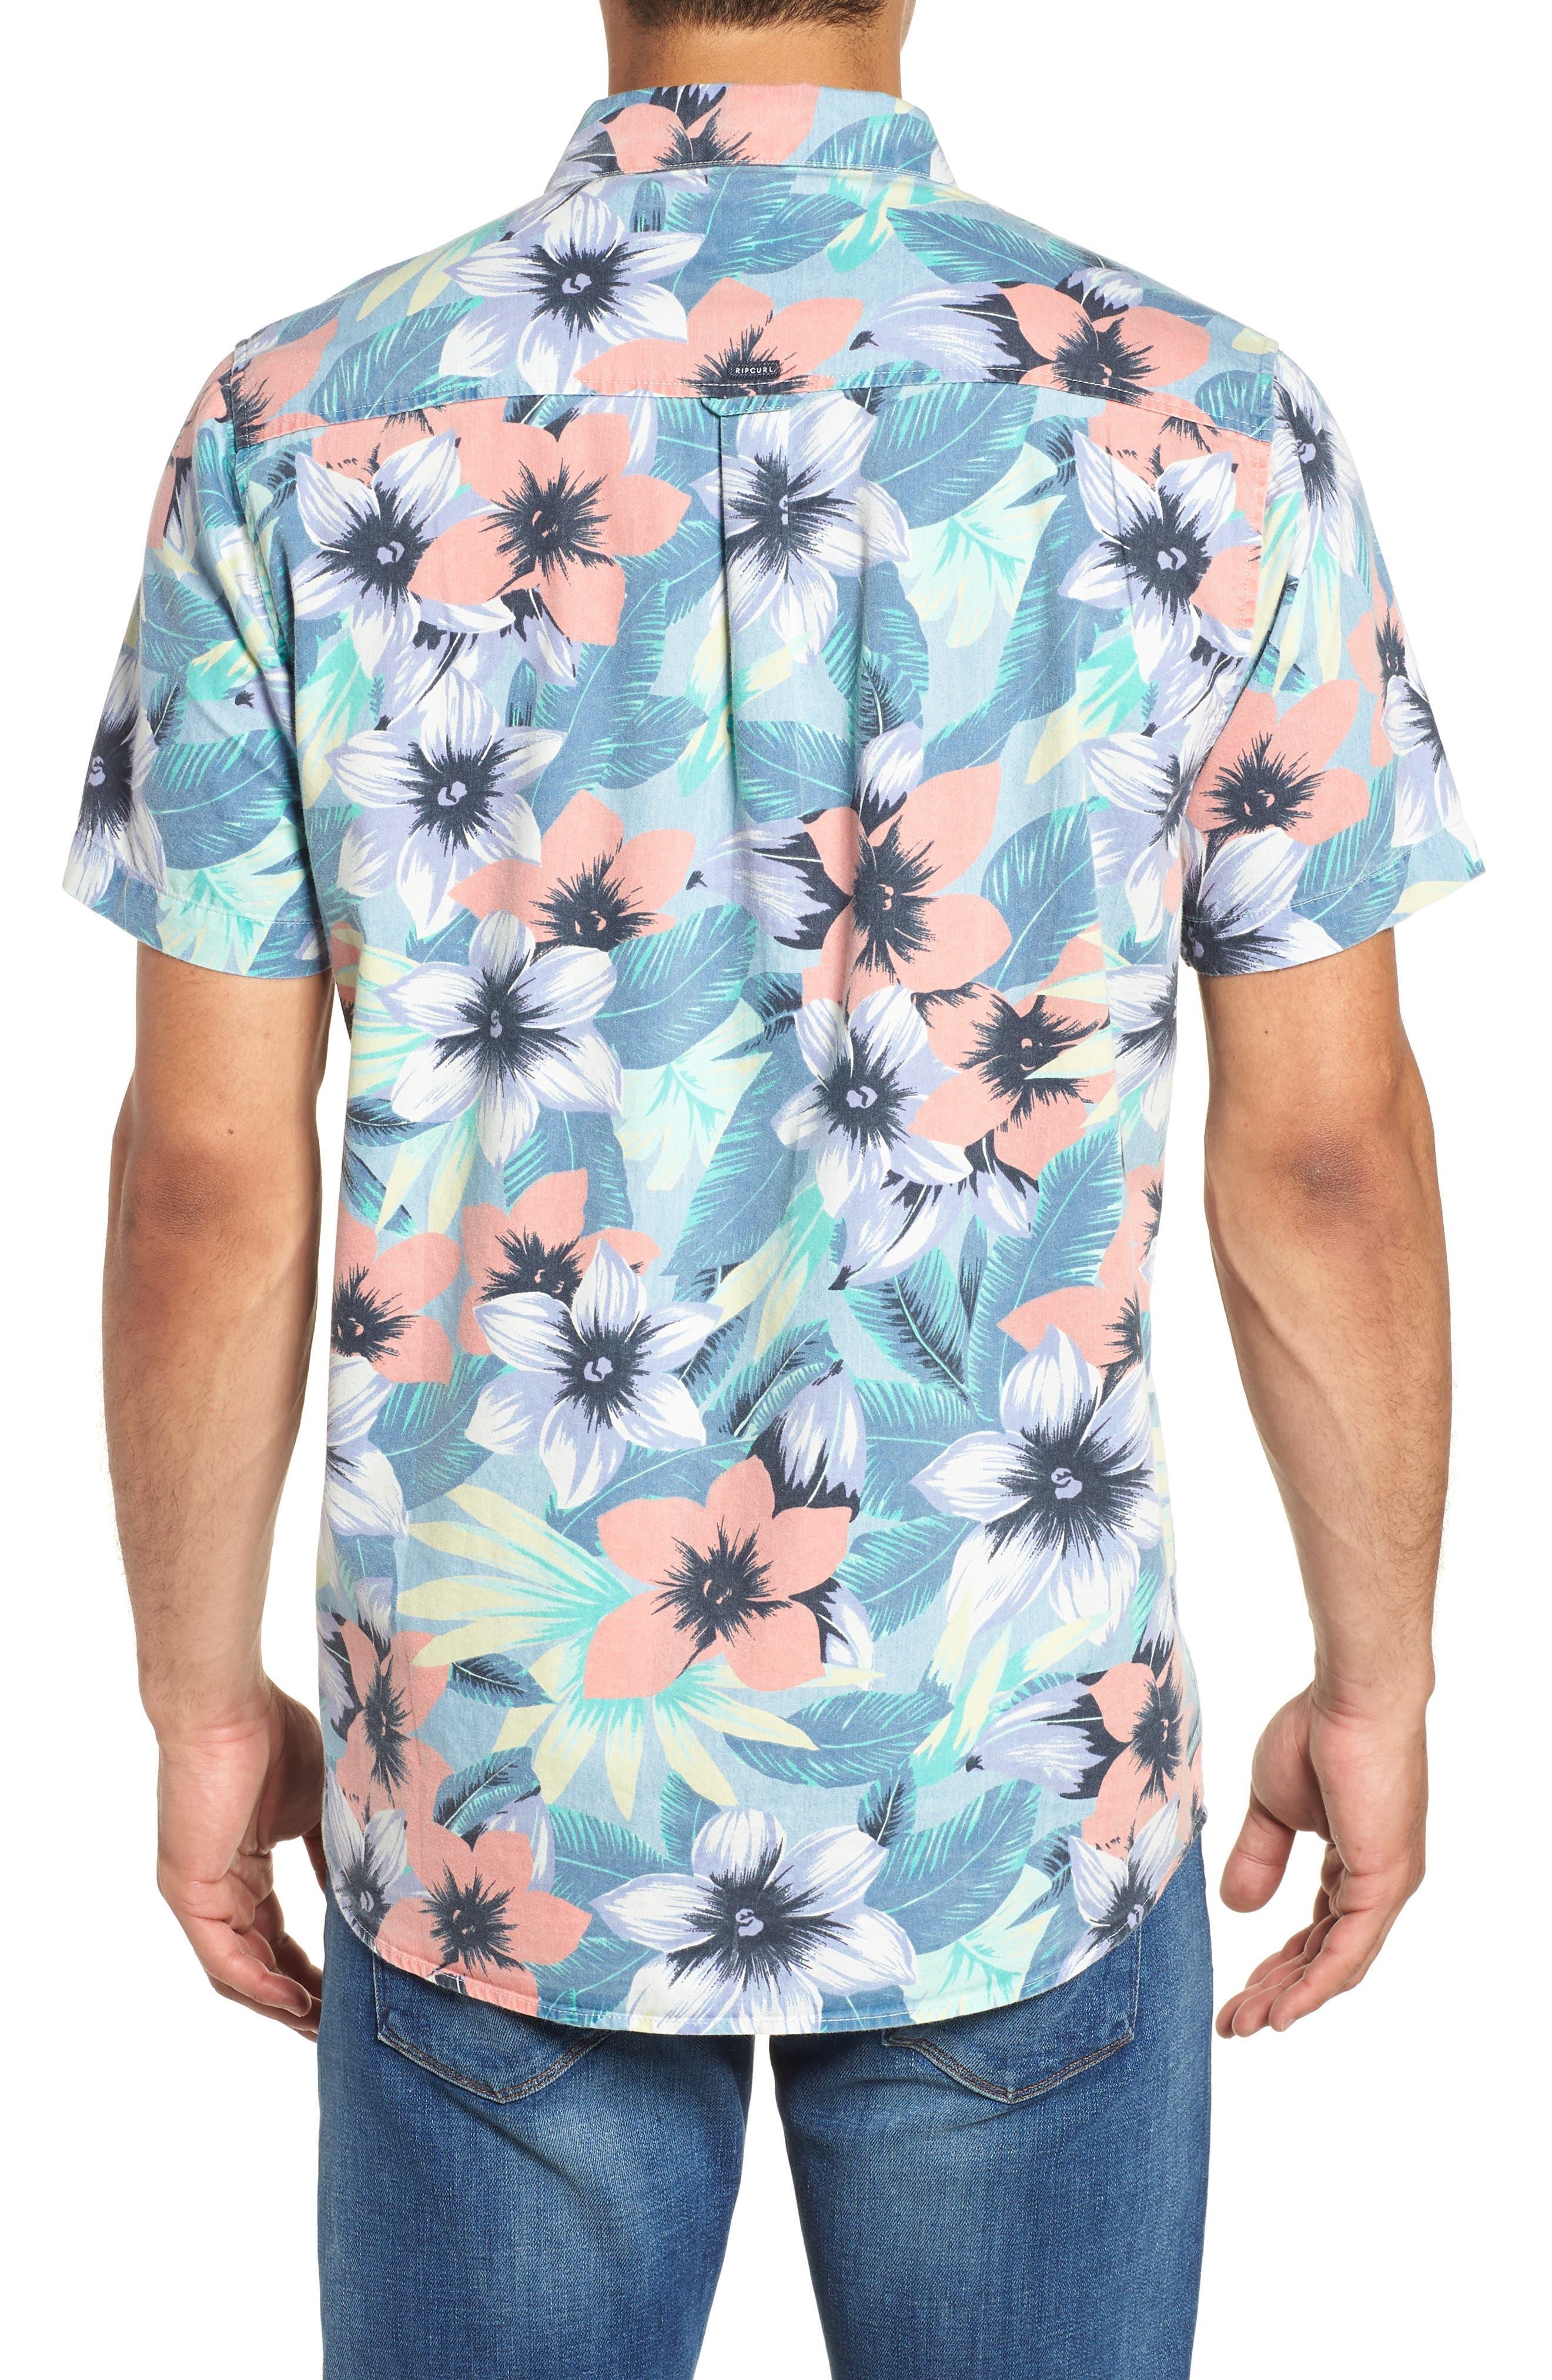 Meledrone Woven Shirt,                             Alternate thumbnail 4, color,